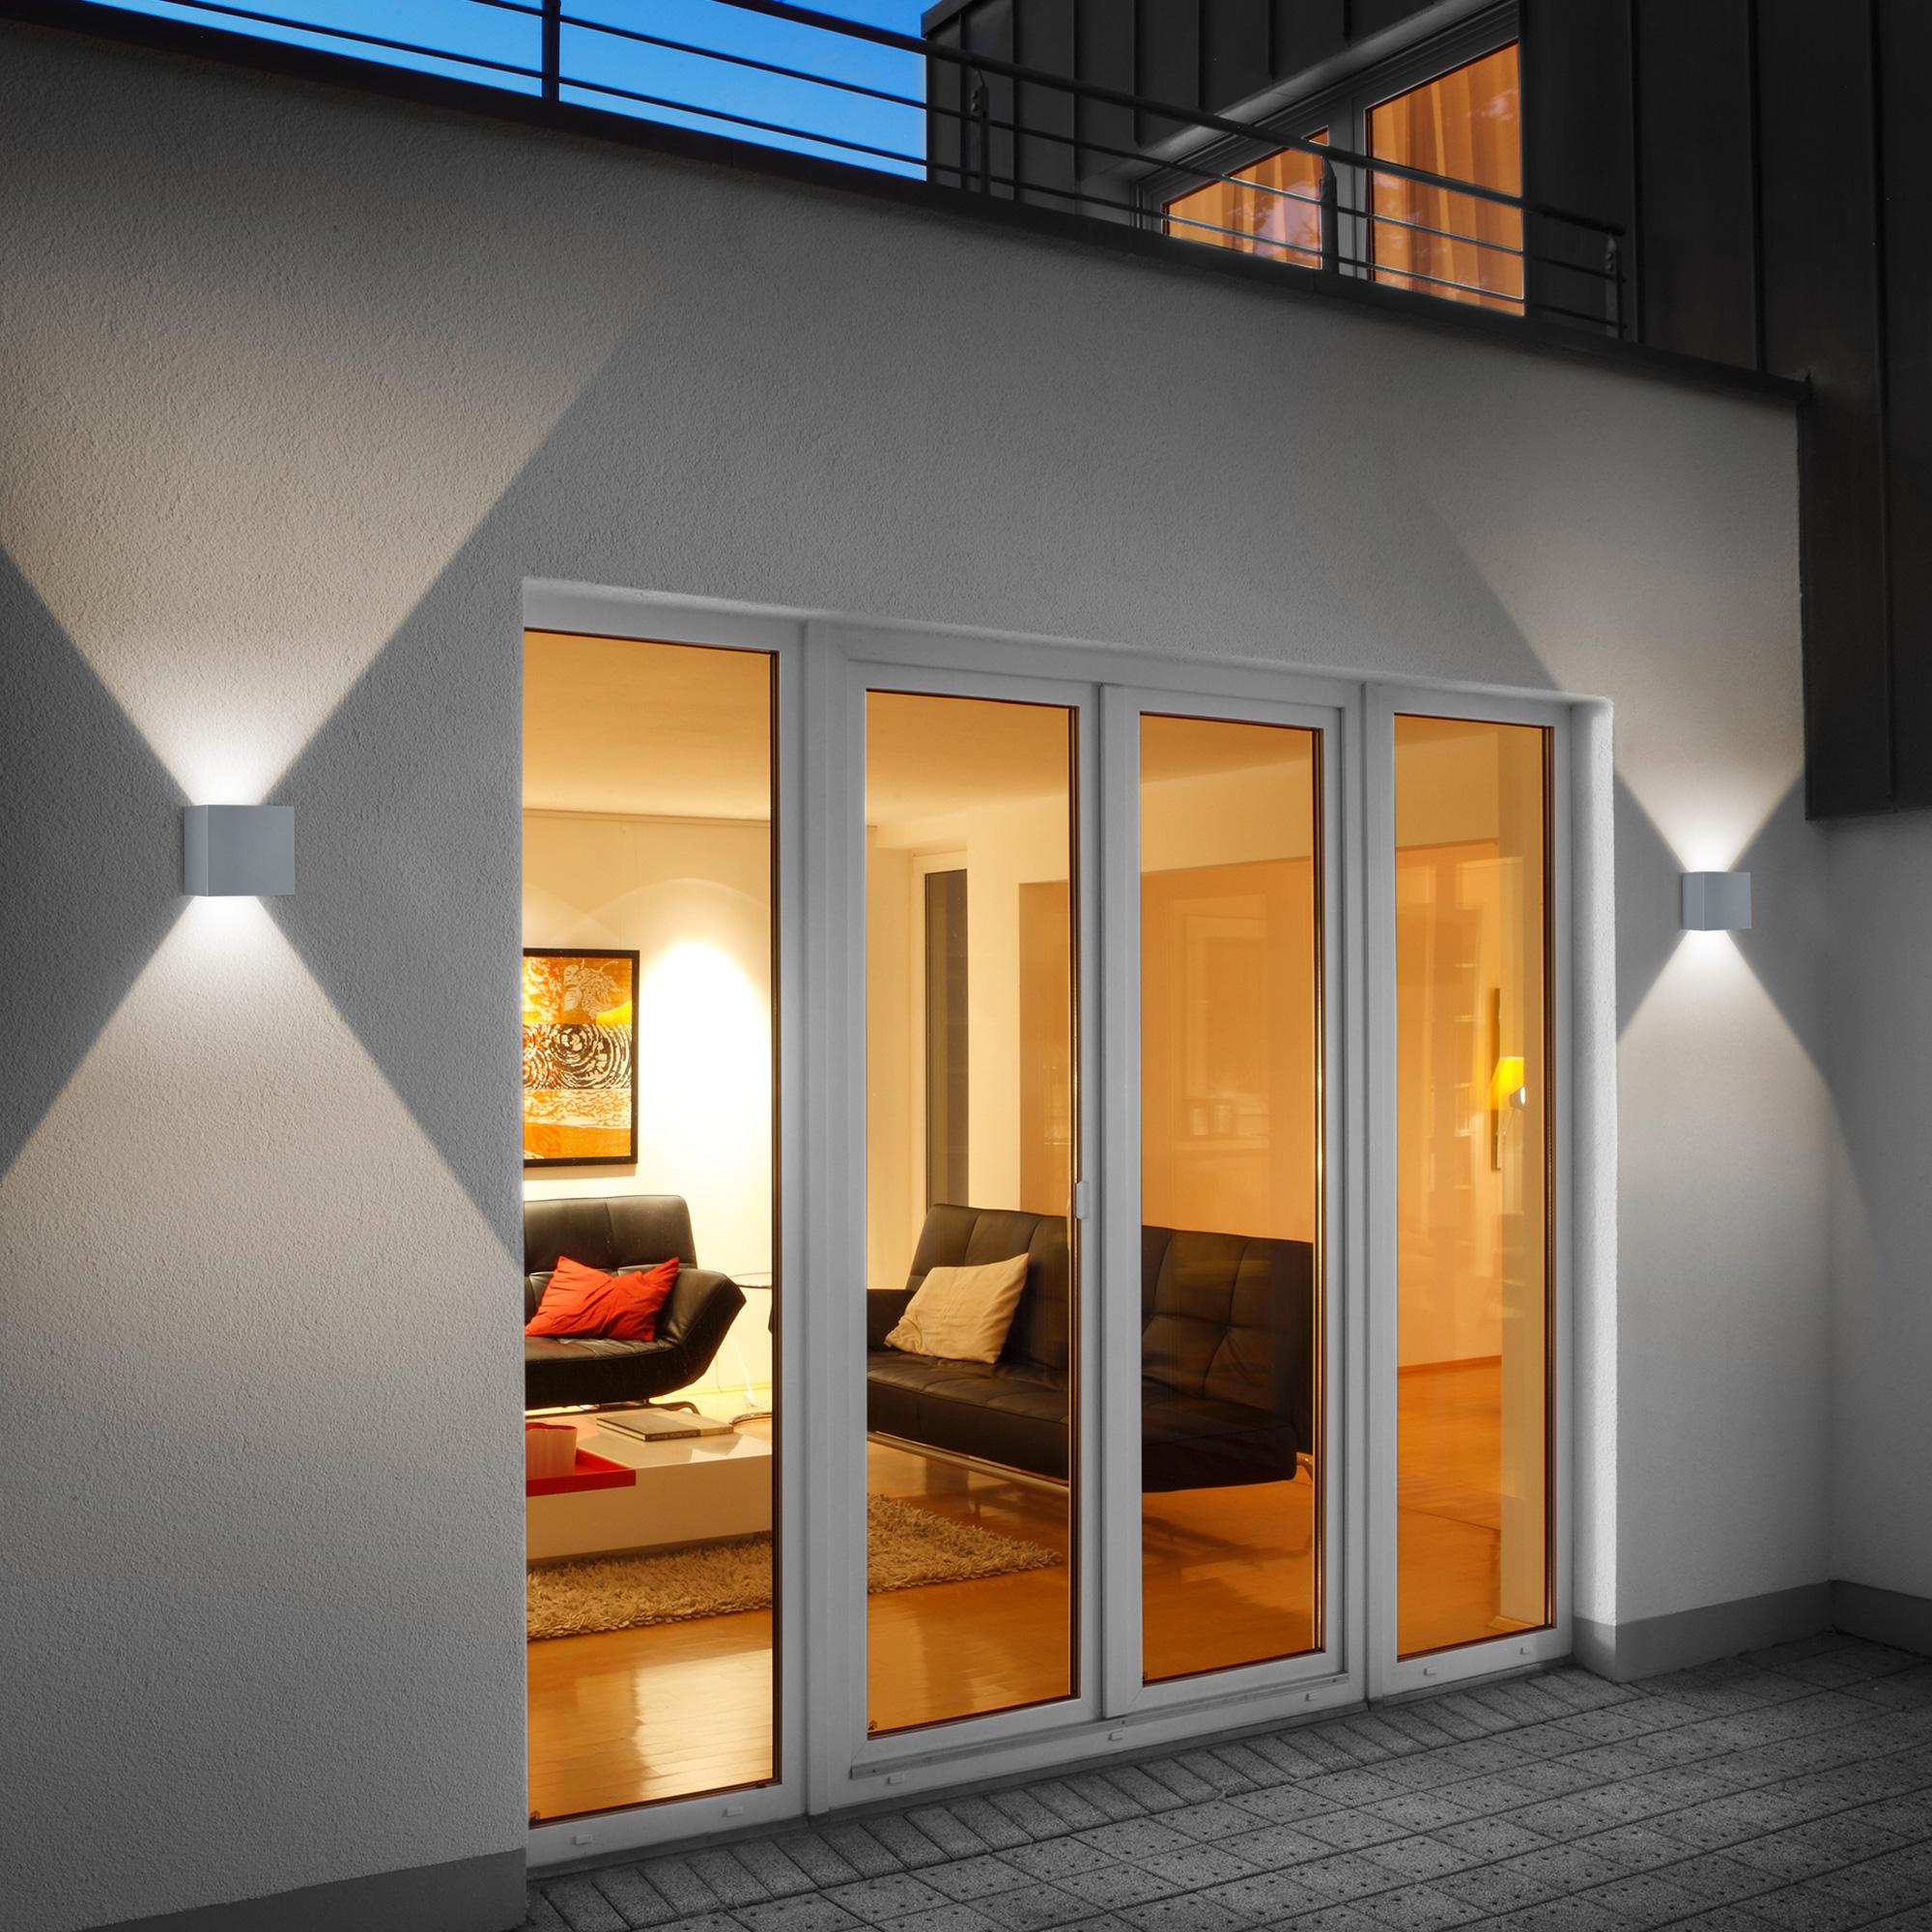 helestra siri 44 led wandleuchte lichtaustritt verstellbar reuter onlineshop. Black Bedroom Furniture Sets. Home Design Ideas